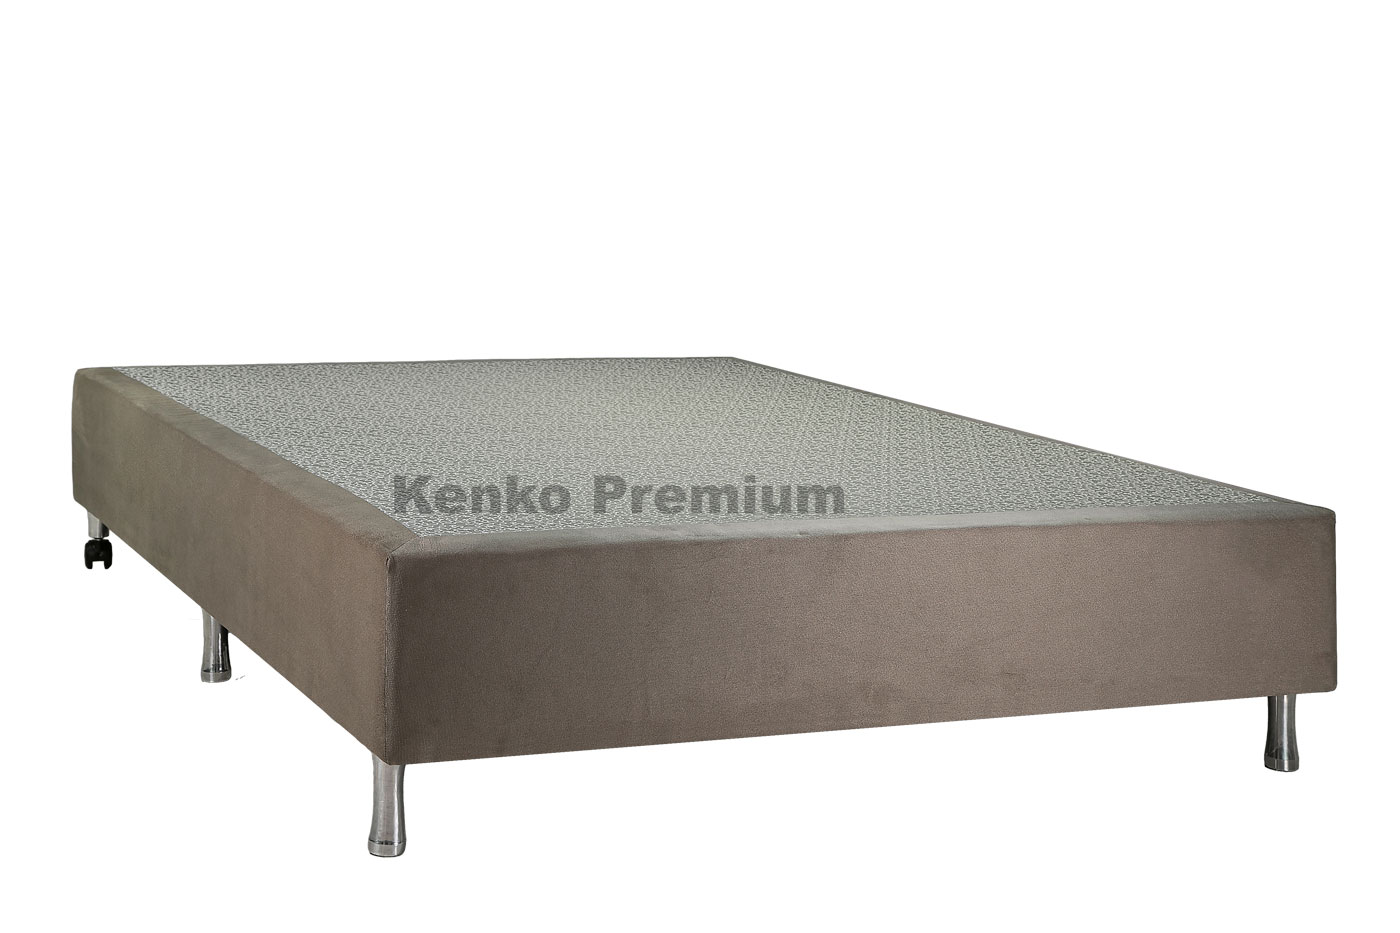 Box Base Para Colchão Iluminado Casal 1,38x1,88 Usb C/kit Conect Suede Kenko Premium   - Kenko Premium Colchões